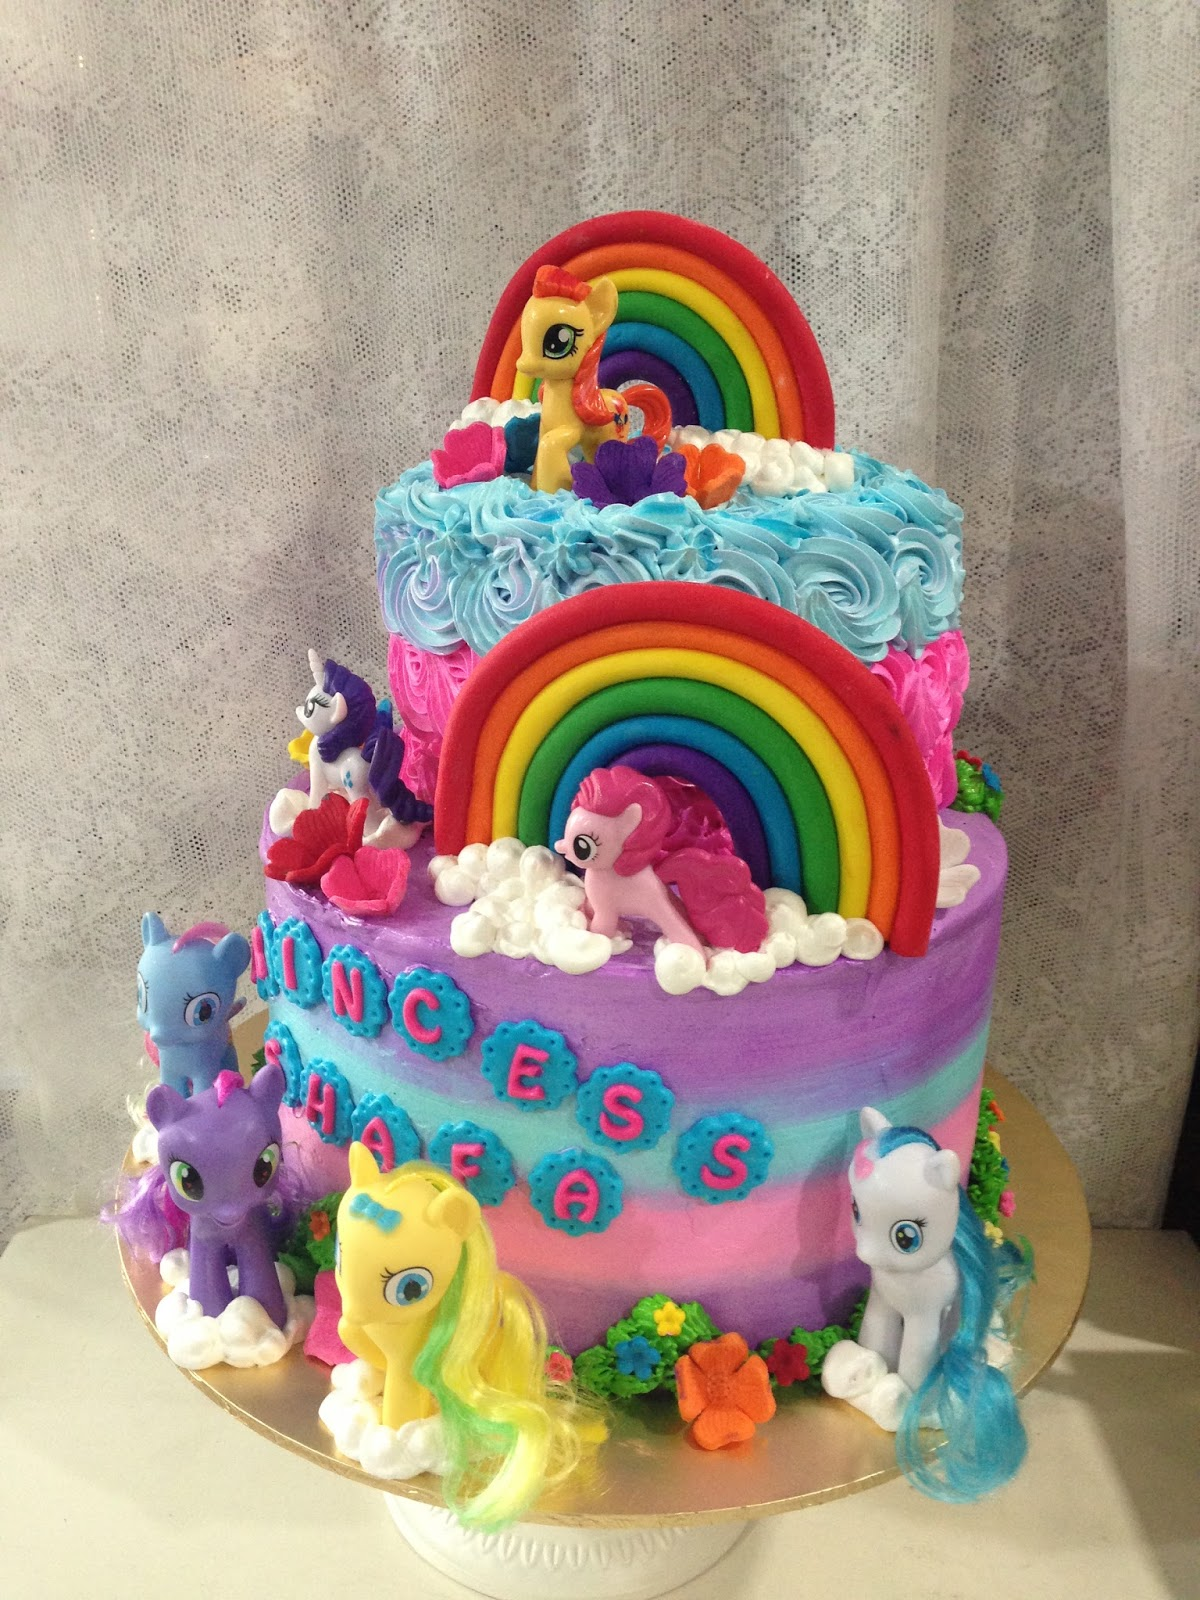 ninie cakes house: Birthday Cakes My Little Pony Theme